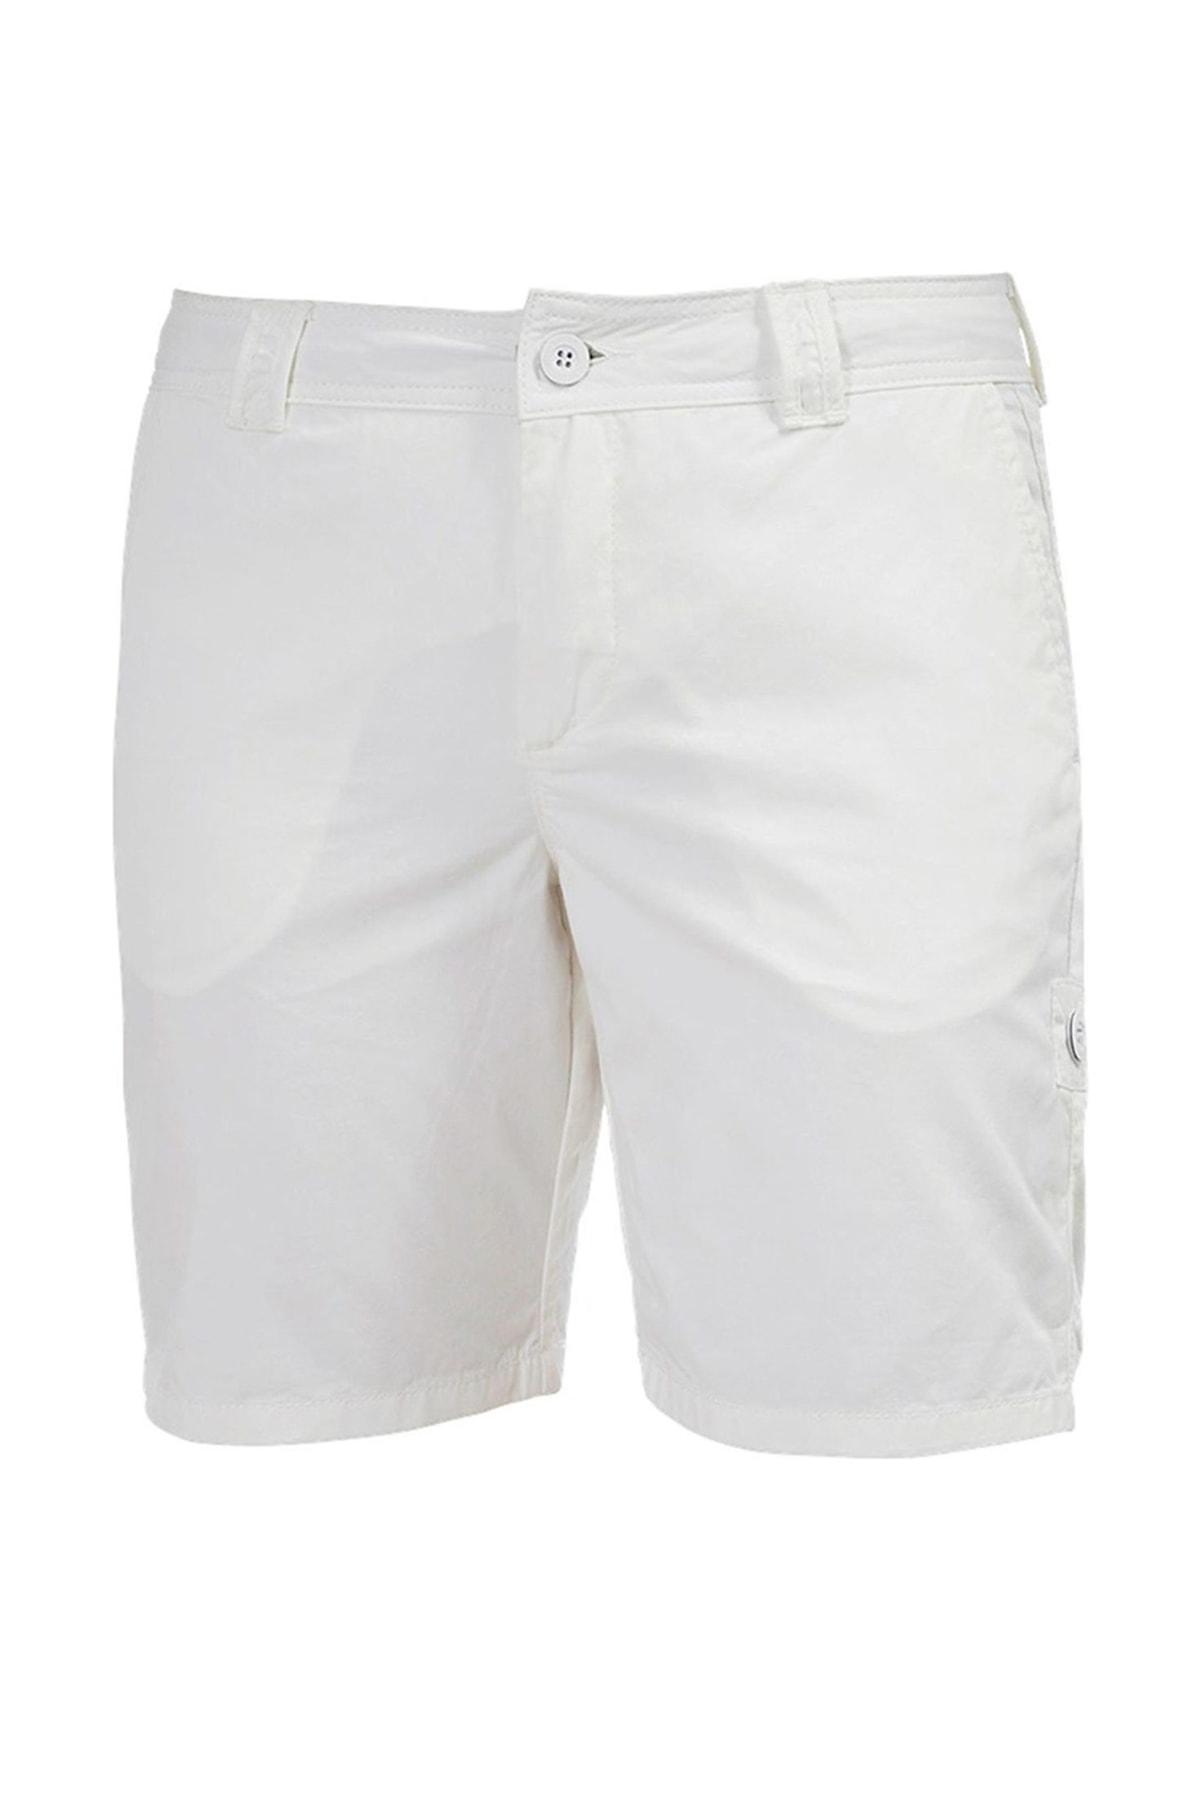 Helly Hansen Kadın Shorts Şort & Bermuda HHA.51579 1